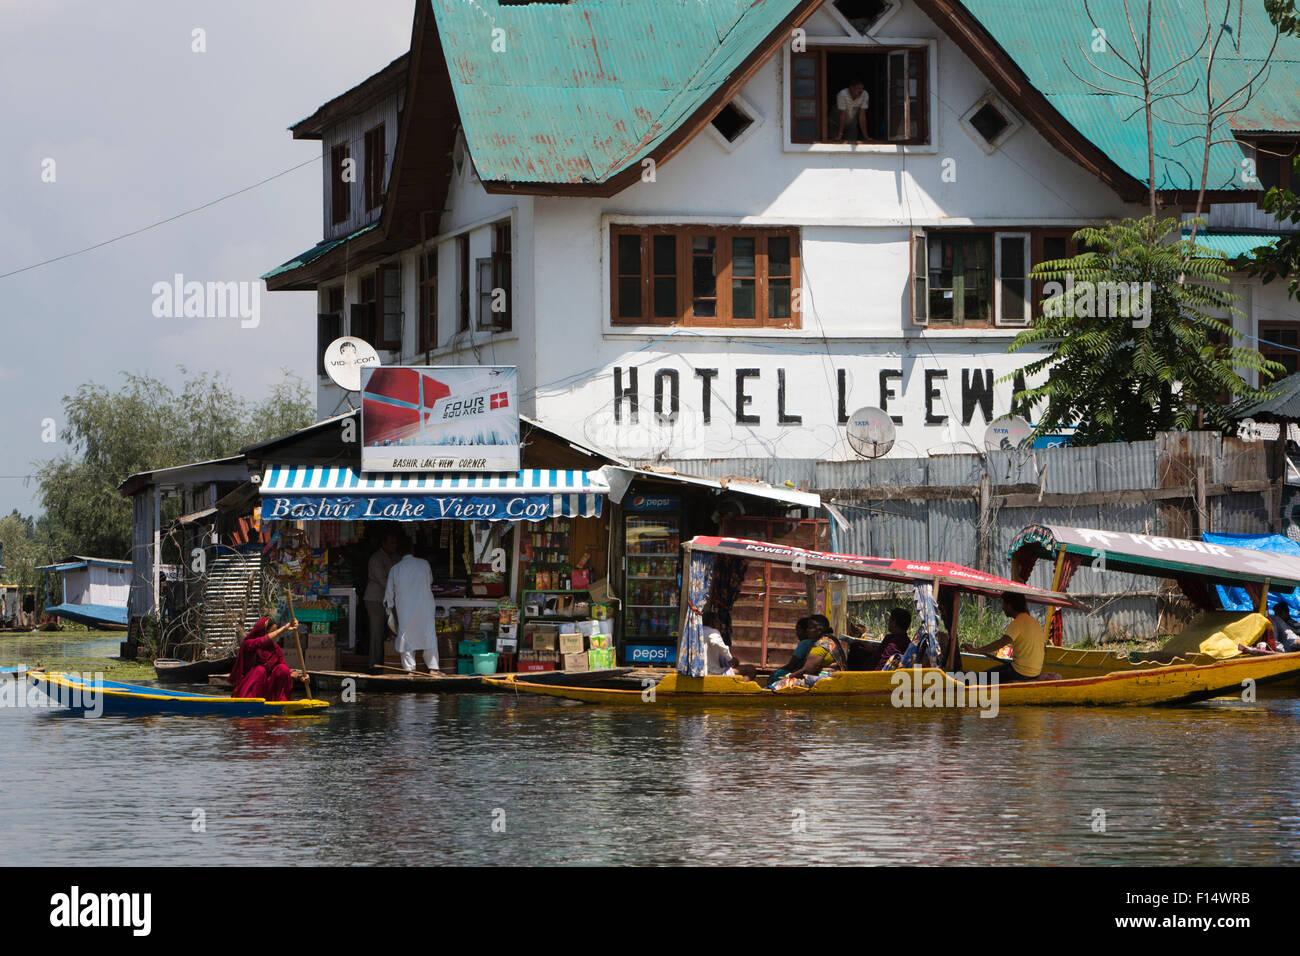 India, Jammu & Kashmir, Srinagar, Dal Lake, Hotel Leeward with connection to VS Naipaul, now Police Post - Stock Image